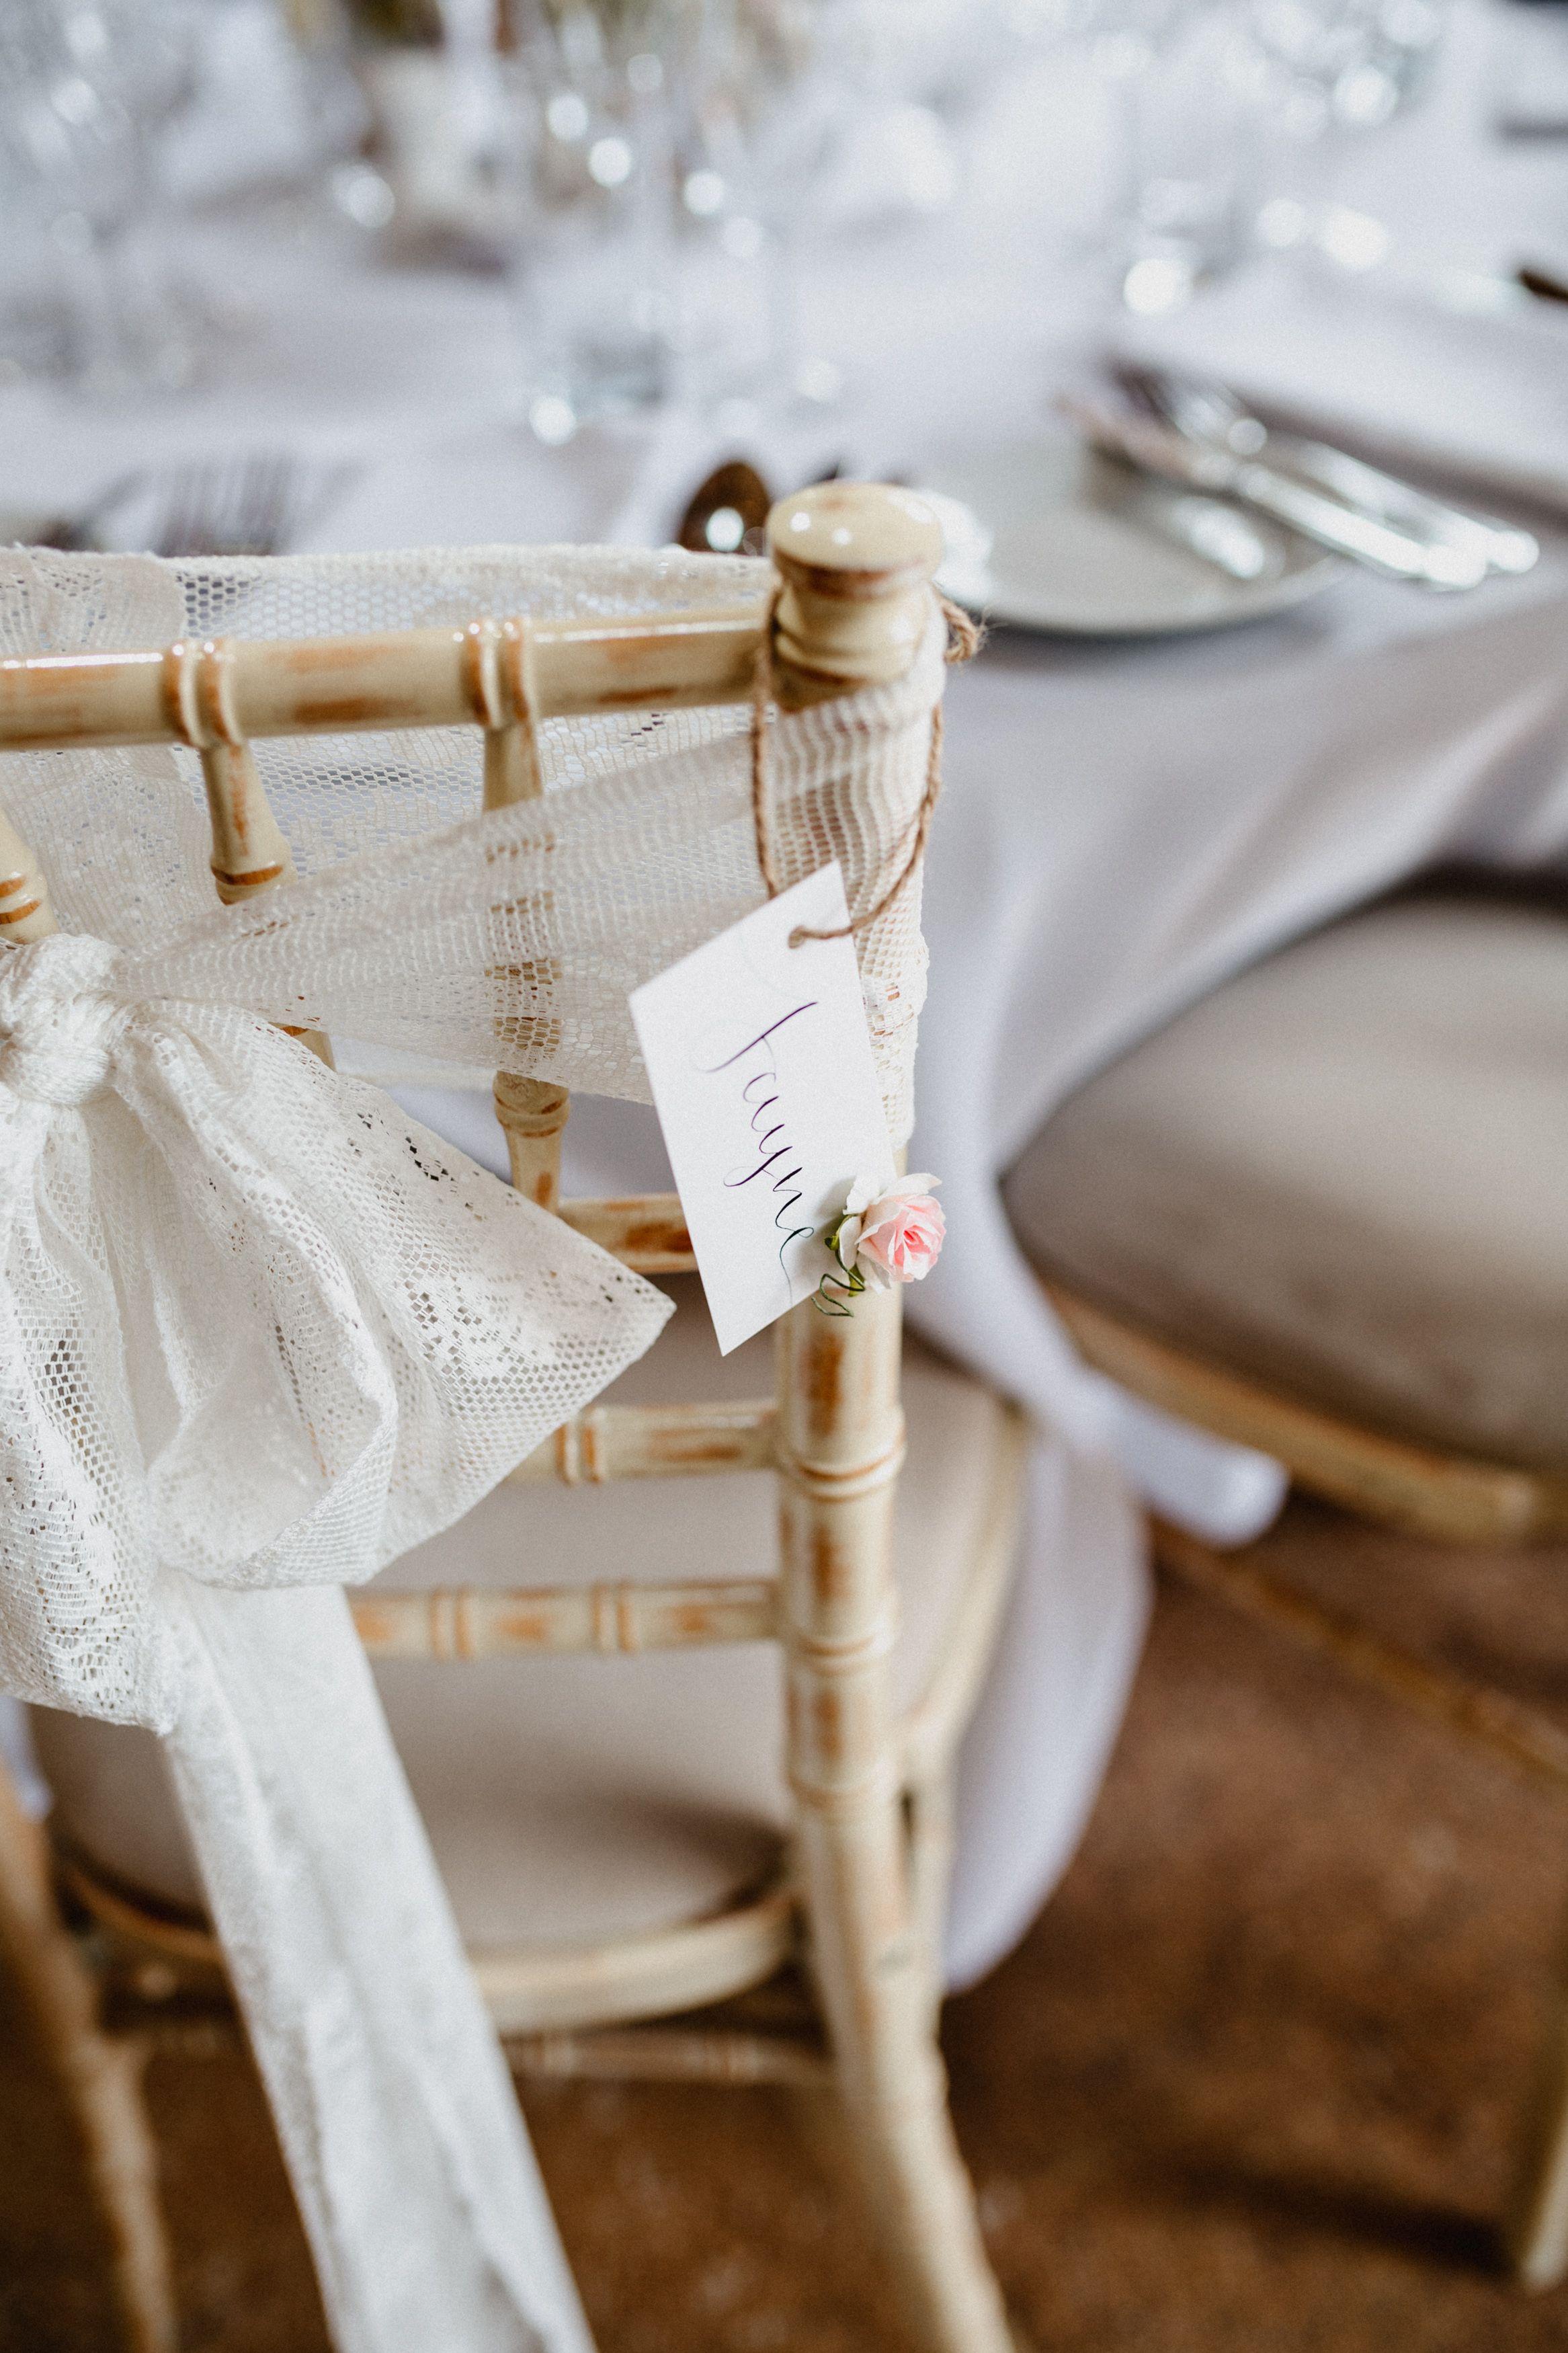 Country Garden Fl Wedding Venue Chair Names Tags I Made